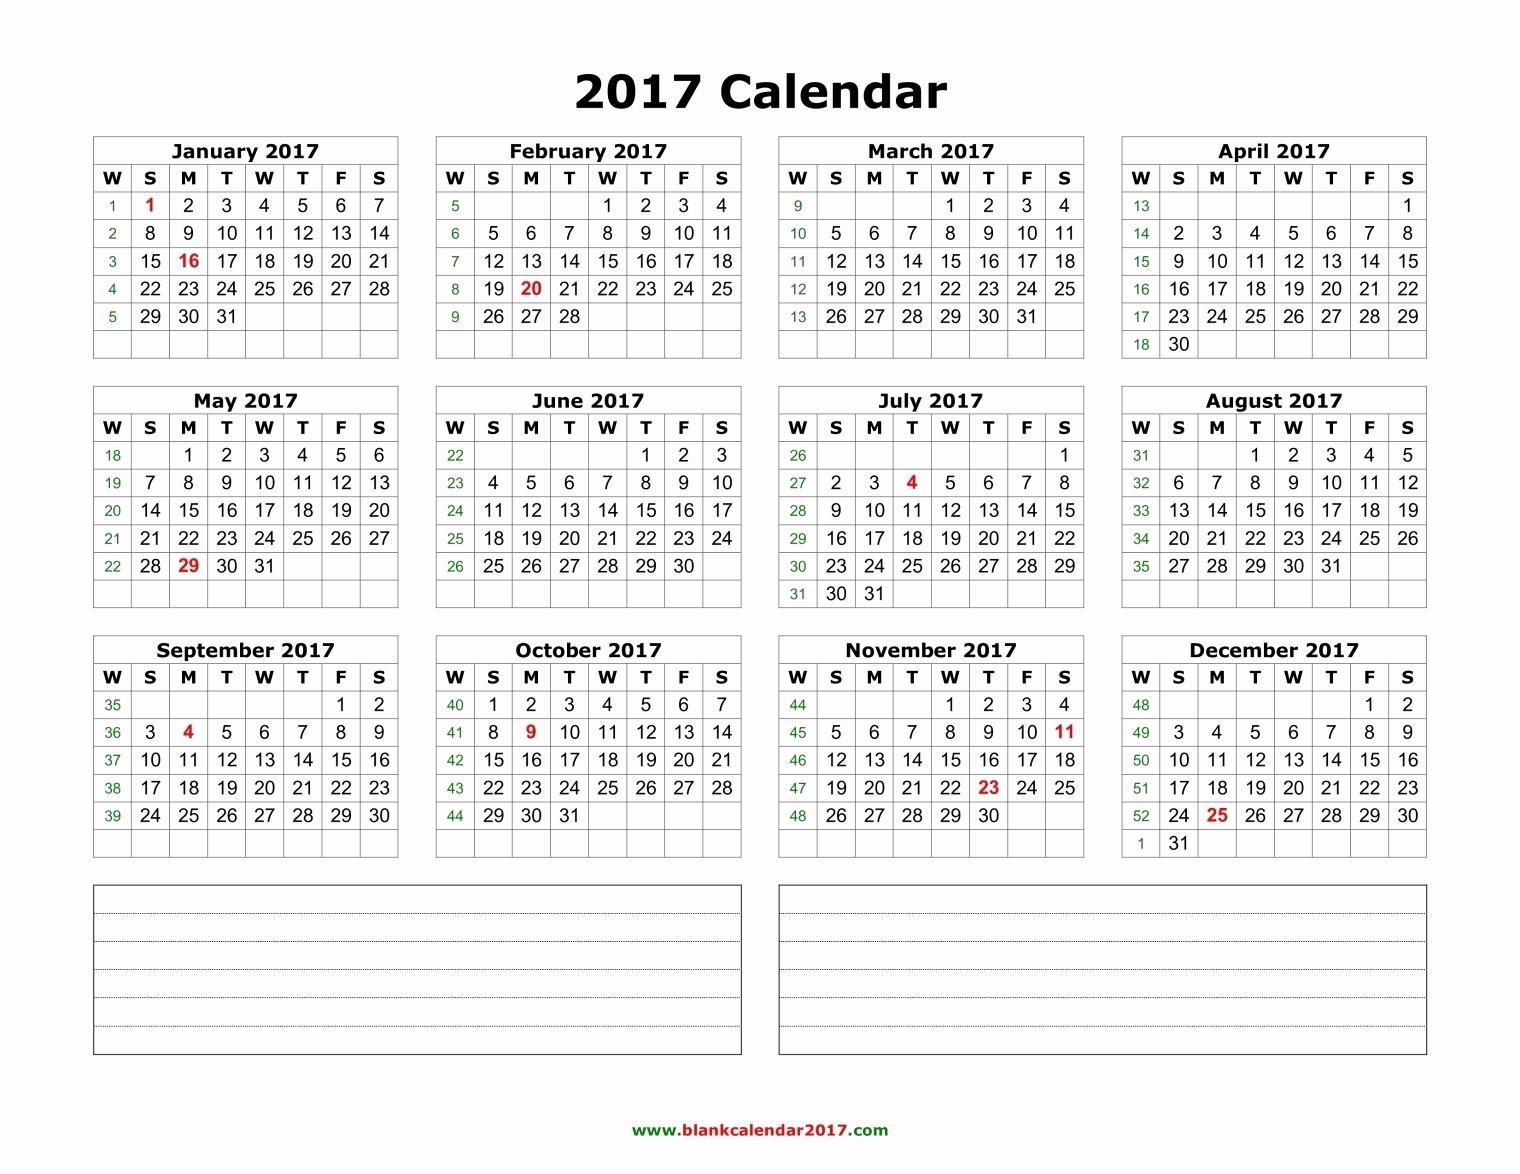 2017 Full Year Printable Calendar Awesome 2017 Calendar Pdf